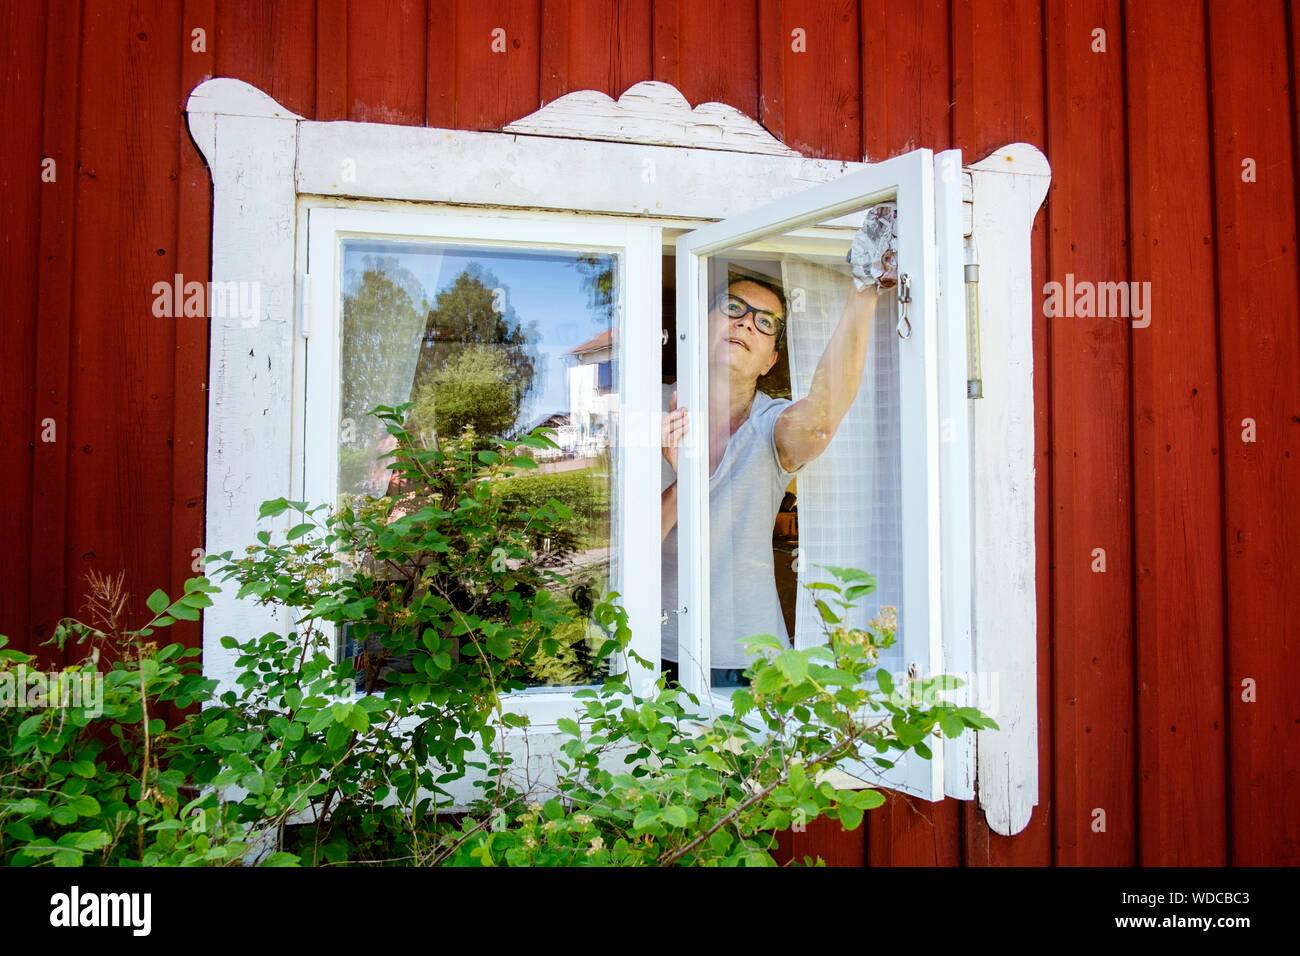 Mature Woman Cleaning Windows Stock Photo 266418435 Alamy